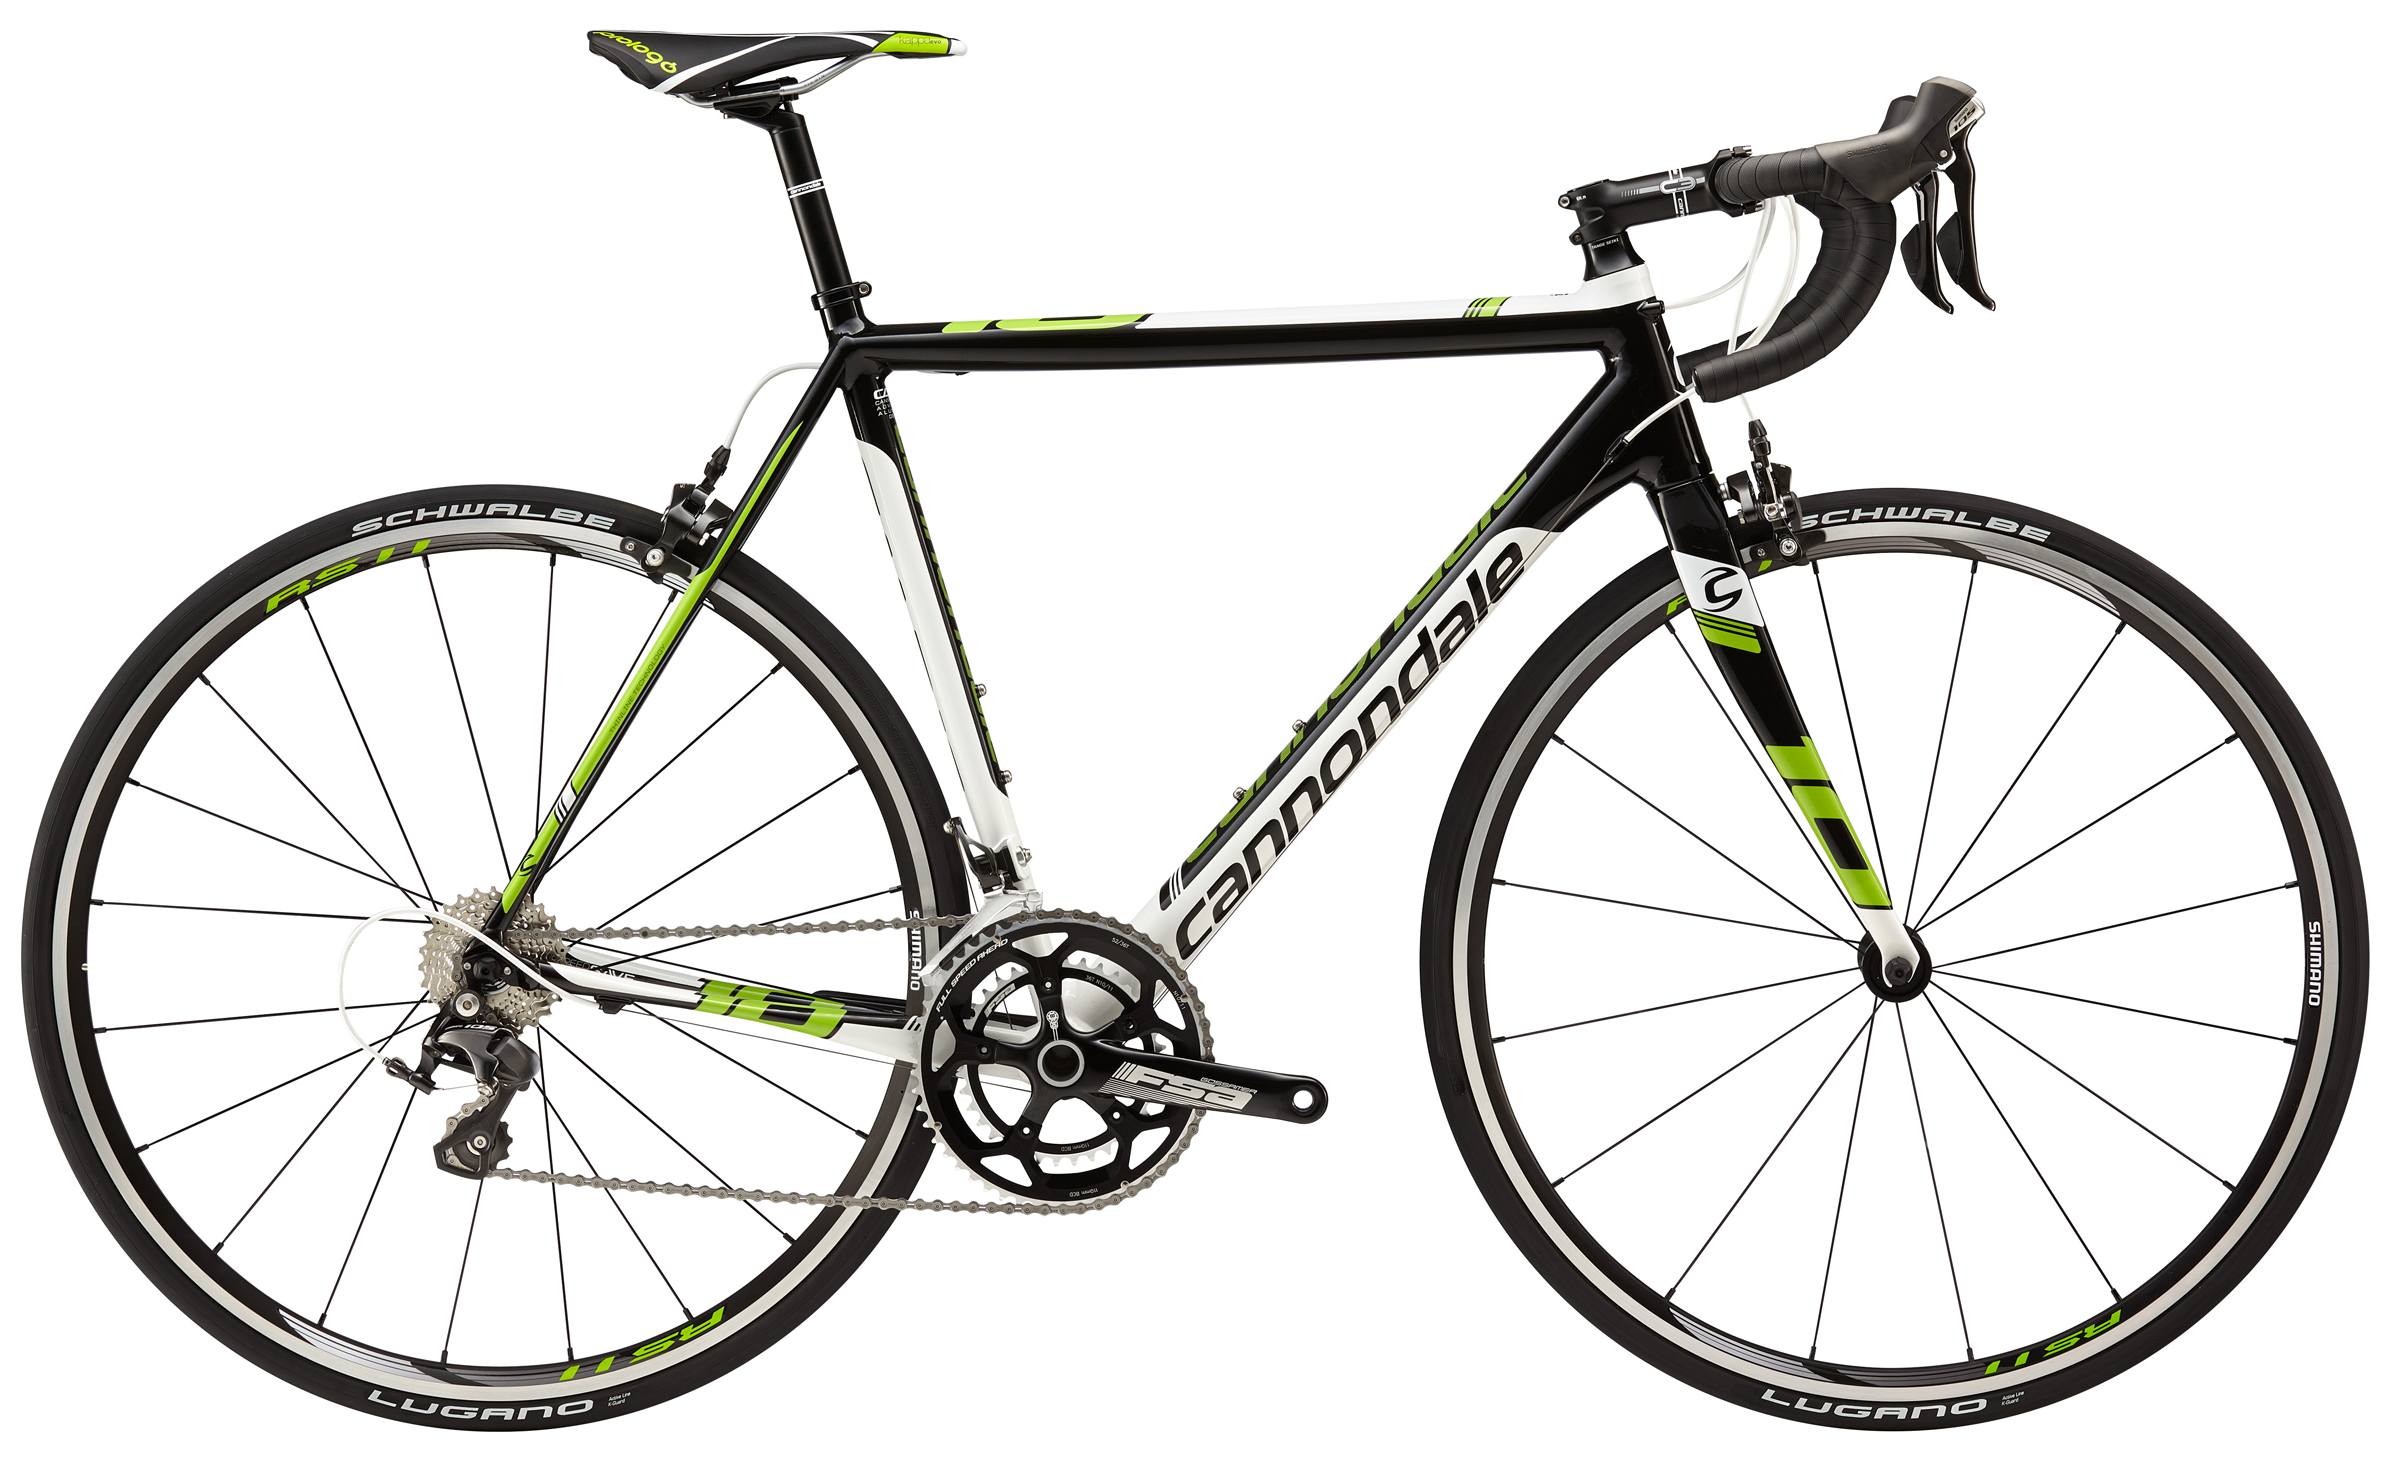 ff84cdb9e25 Cannondale CAAD10 105 5 - The Newbury Park Bicycle Shop